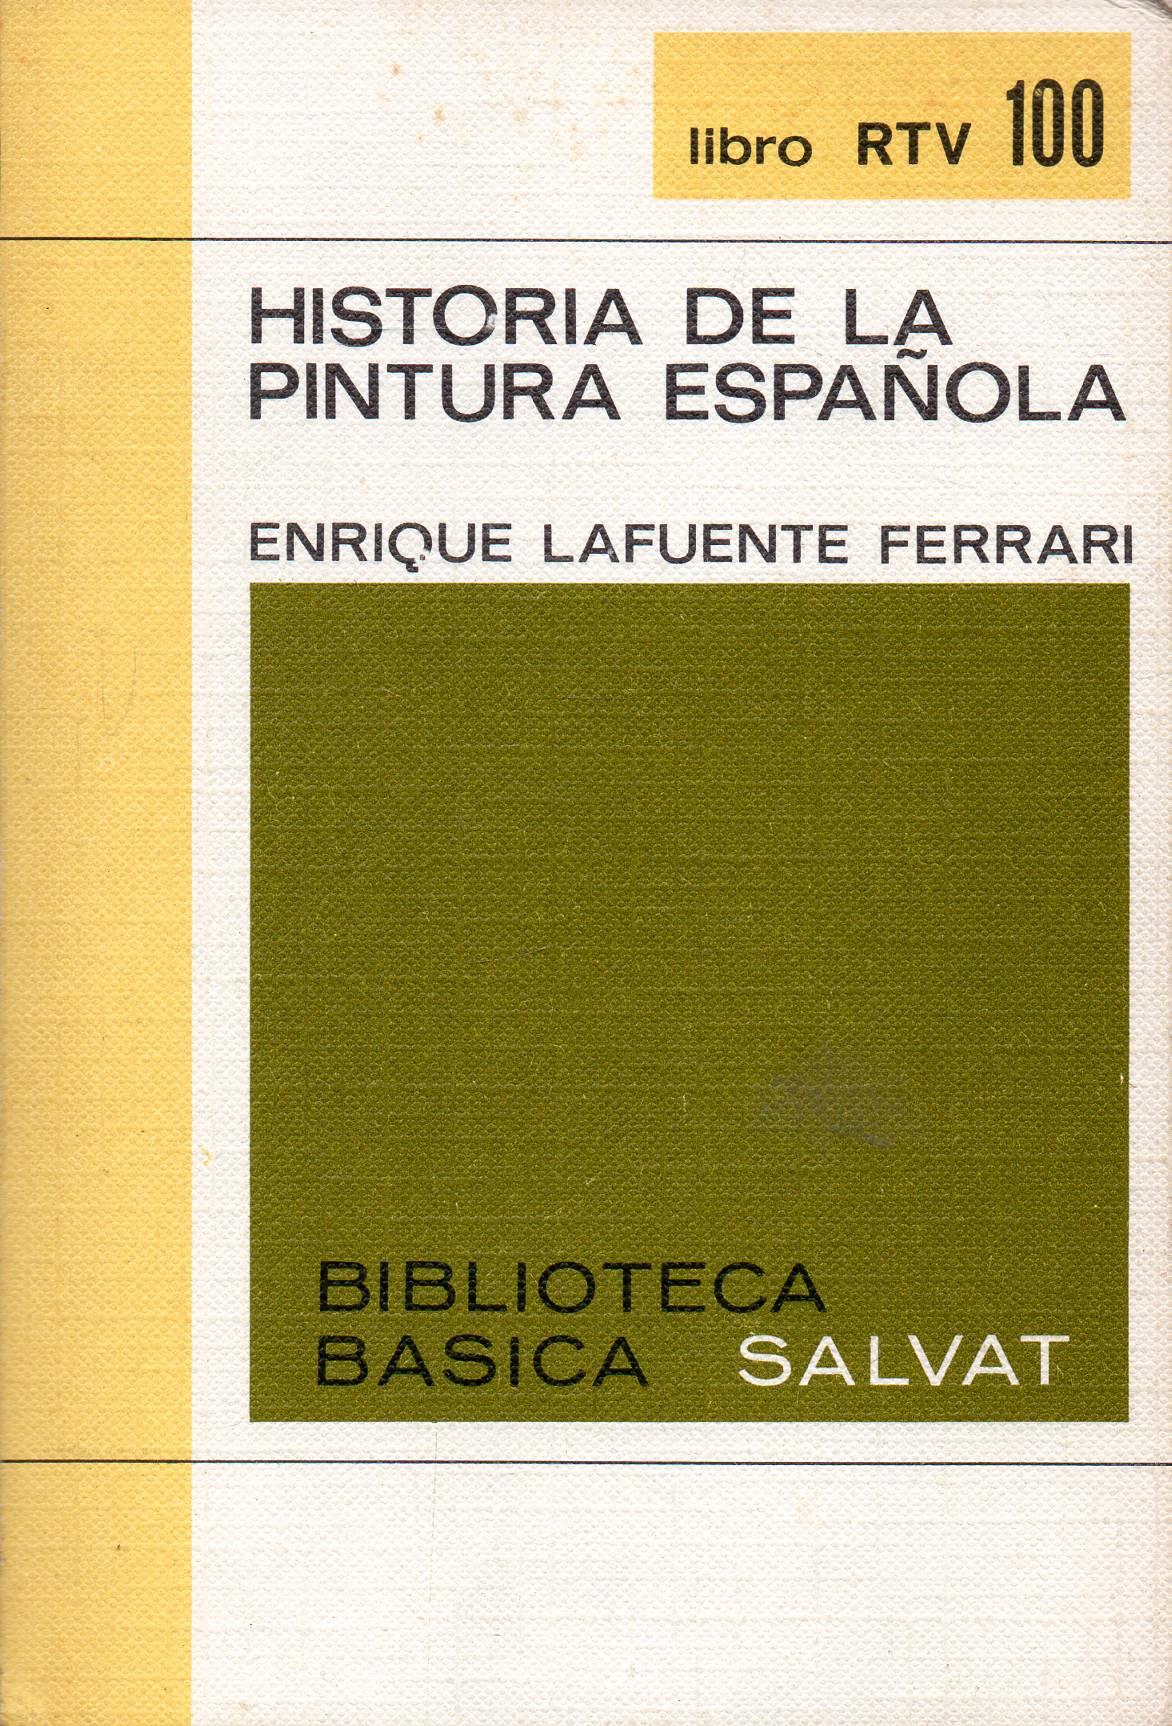 """Historia de la pintura española"""